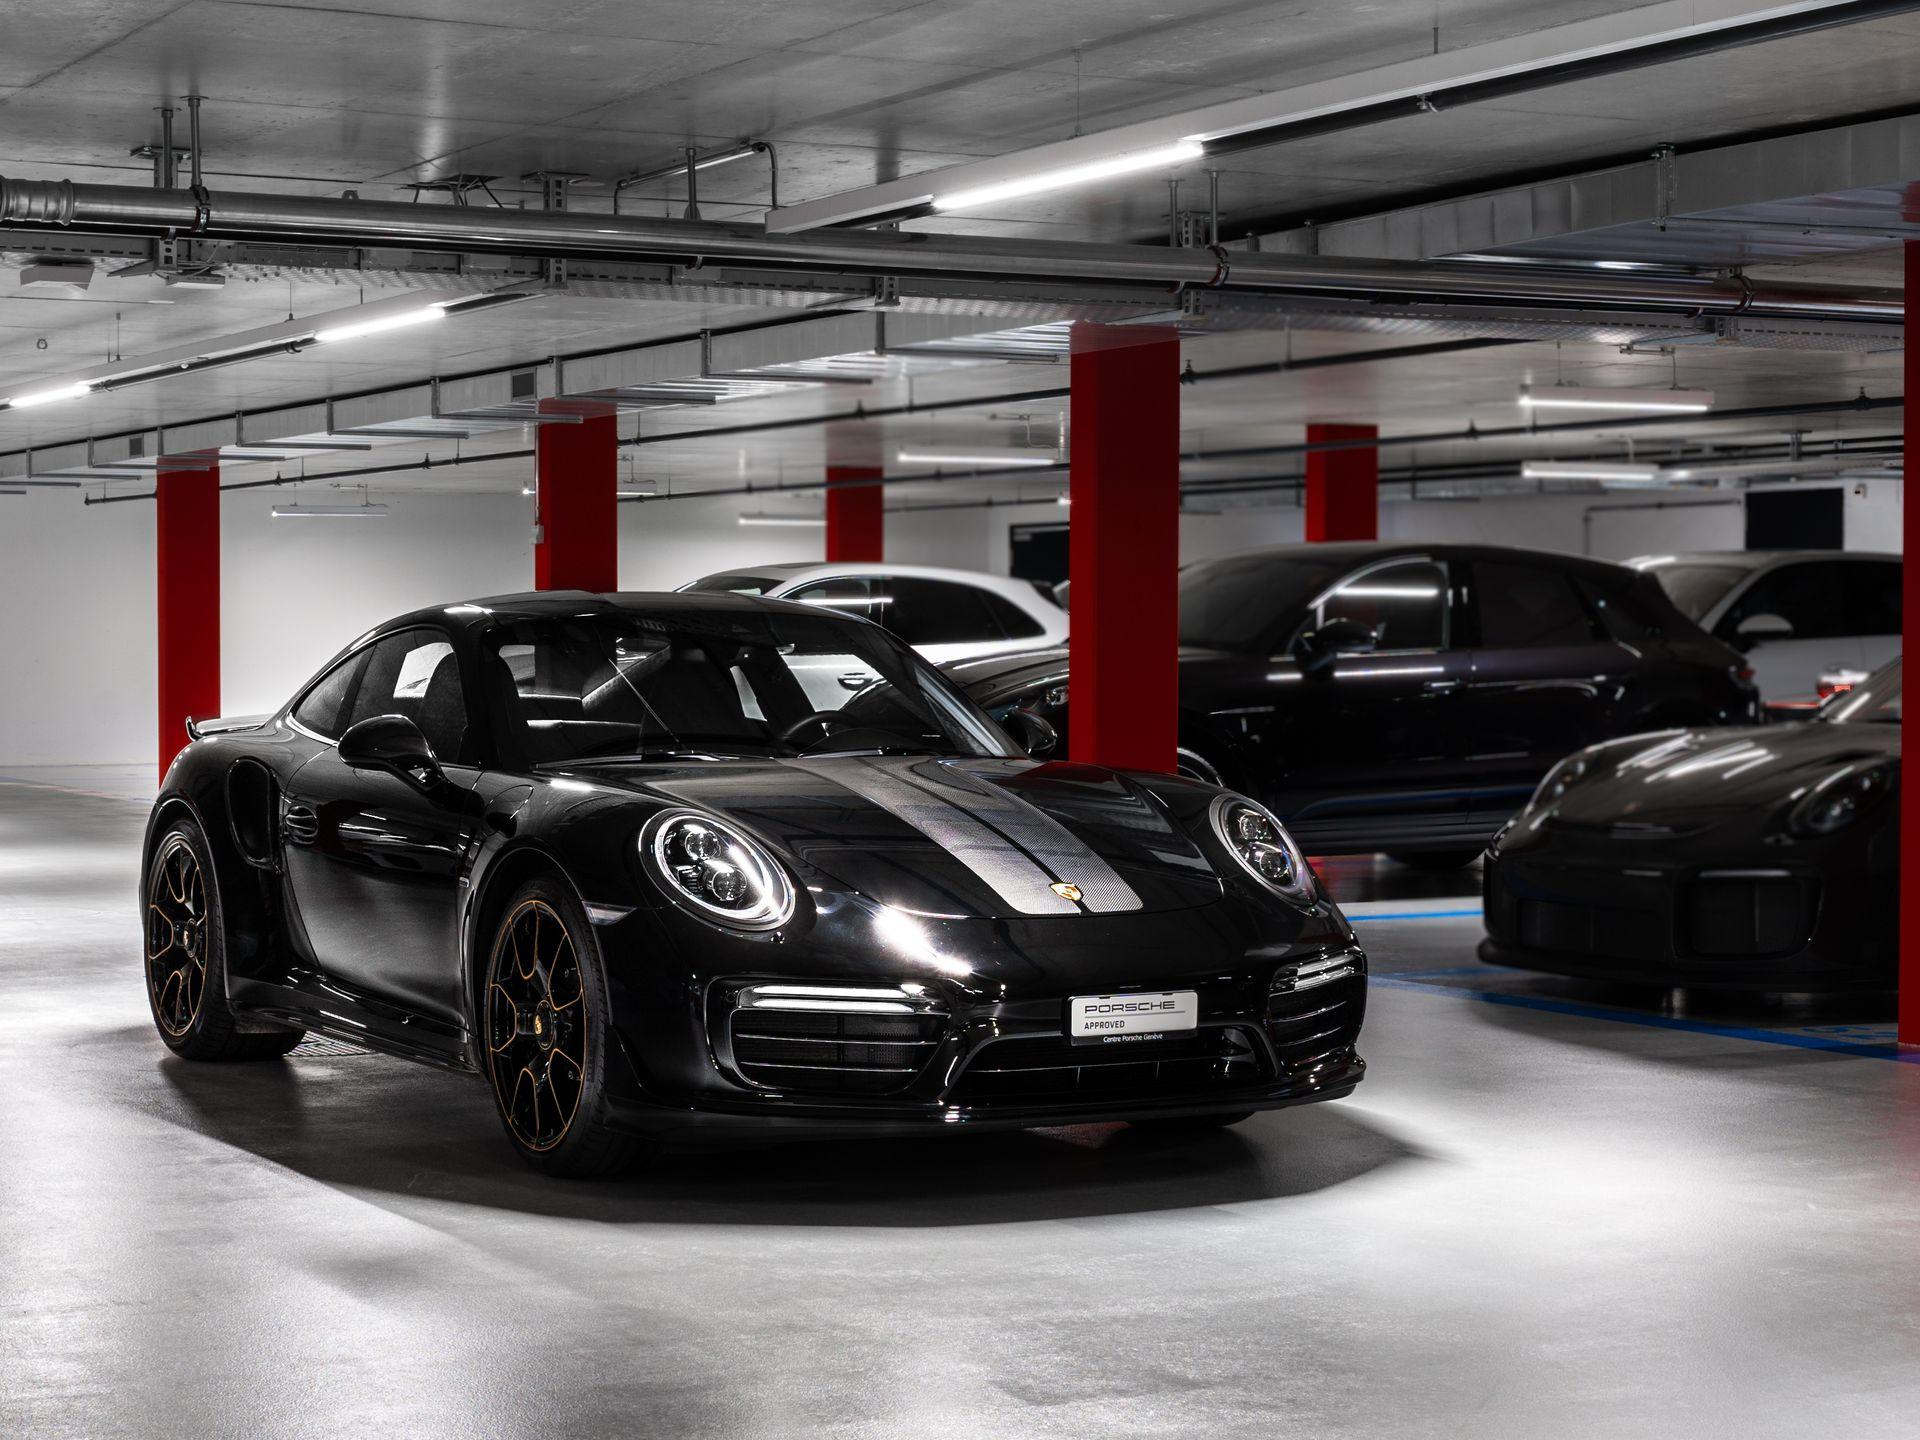 2018 Porsche 911 Turbo S Exclusive Series – 1